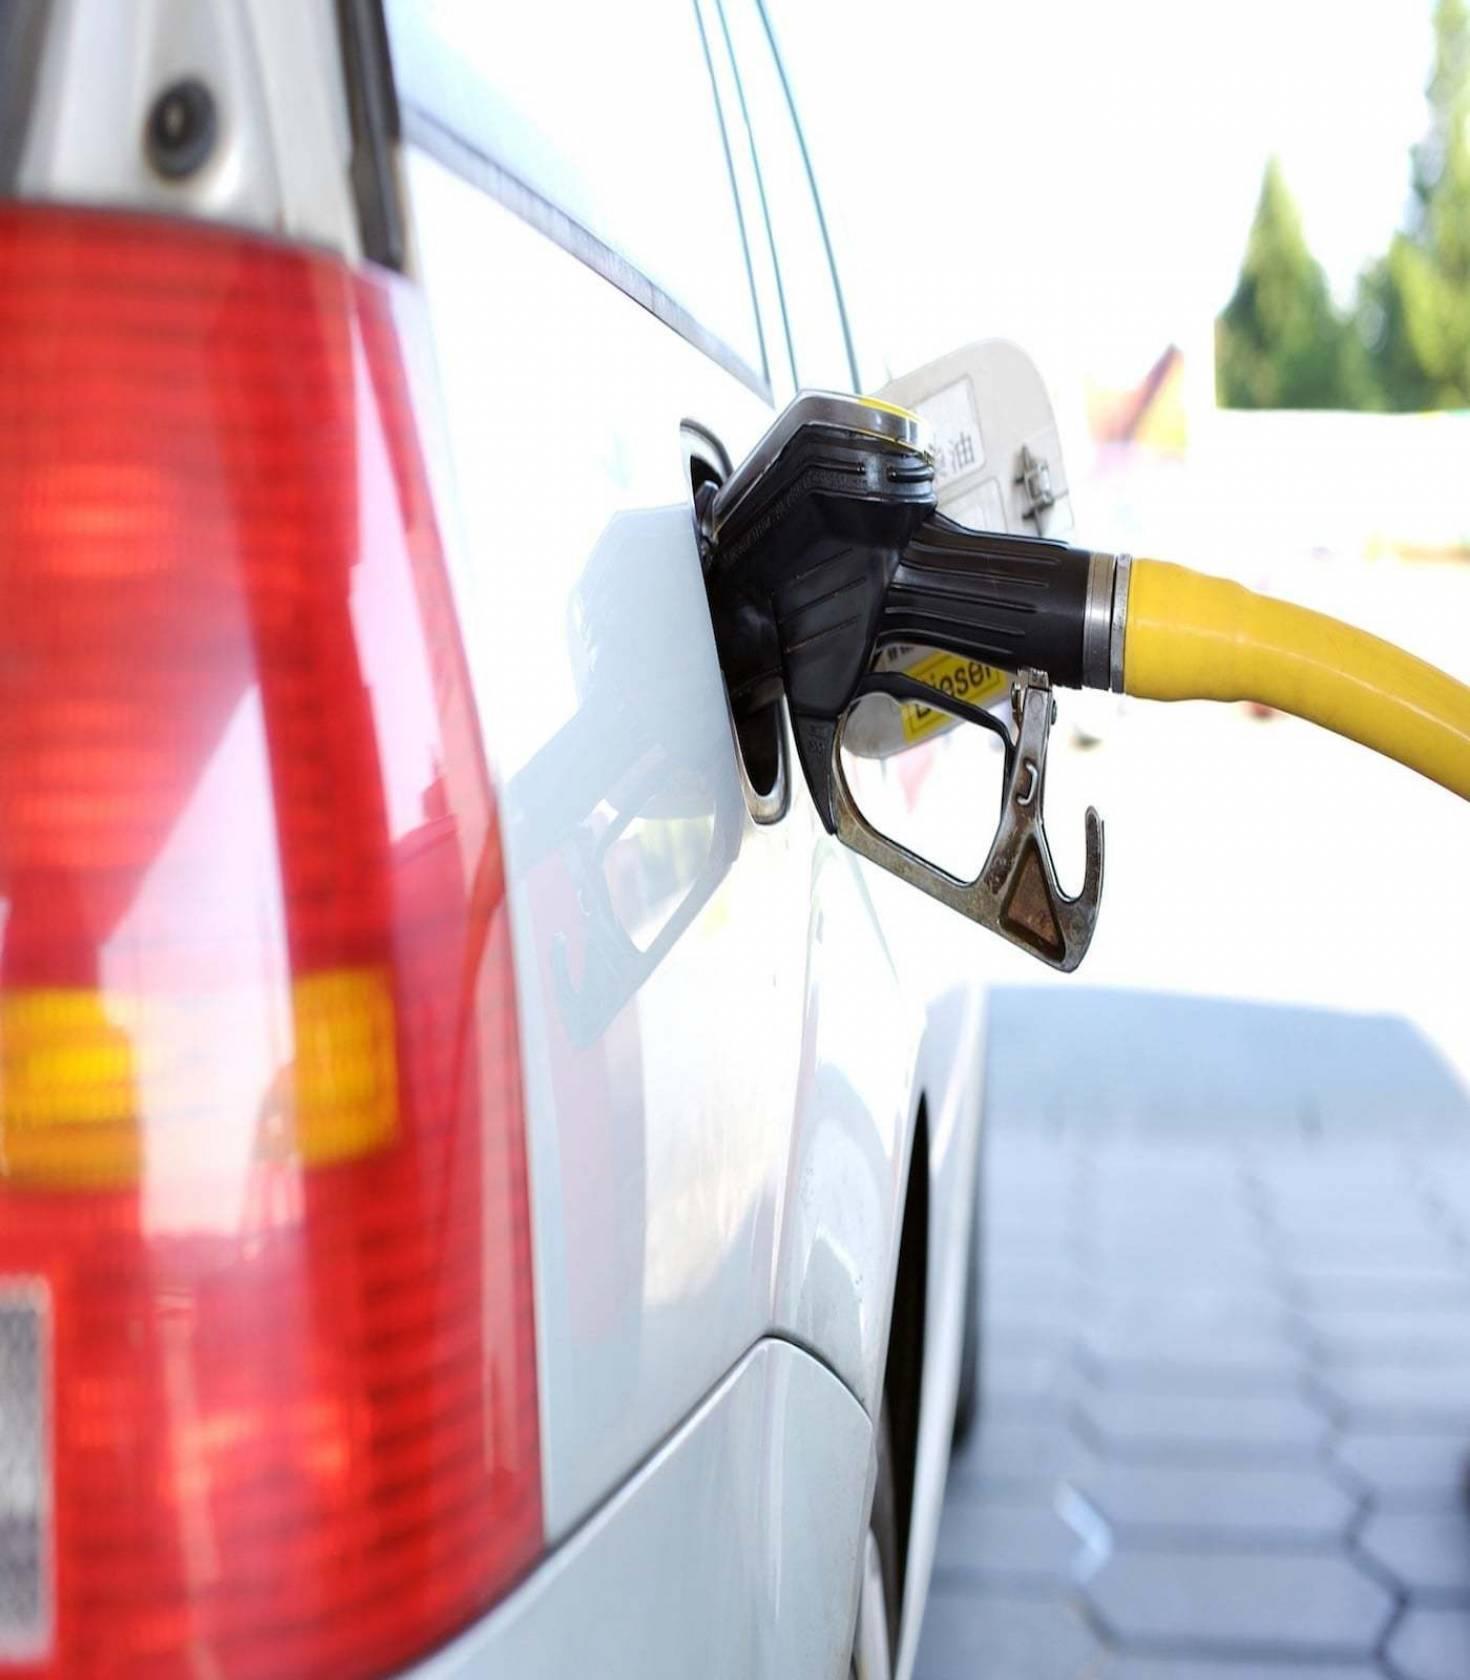 Oil Used In Refueling Car